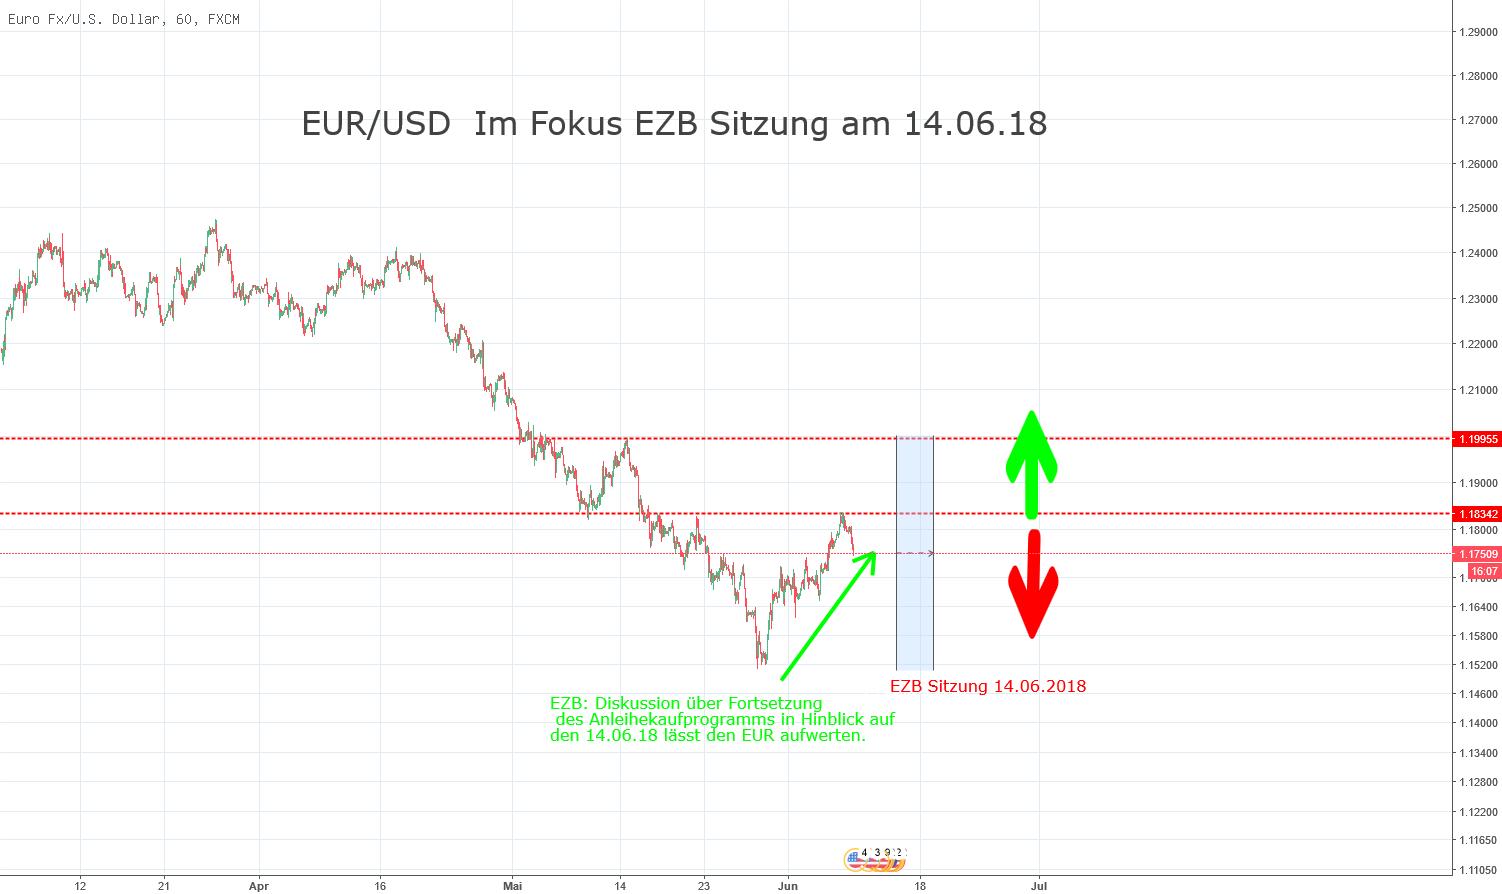 EUR/USD Fokus auf EZB Sitzung am 14.06.2018